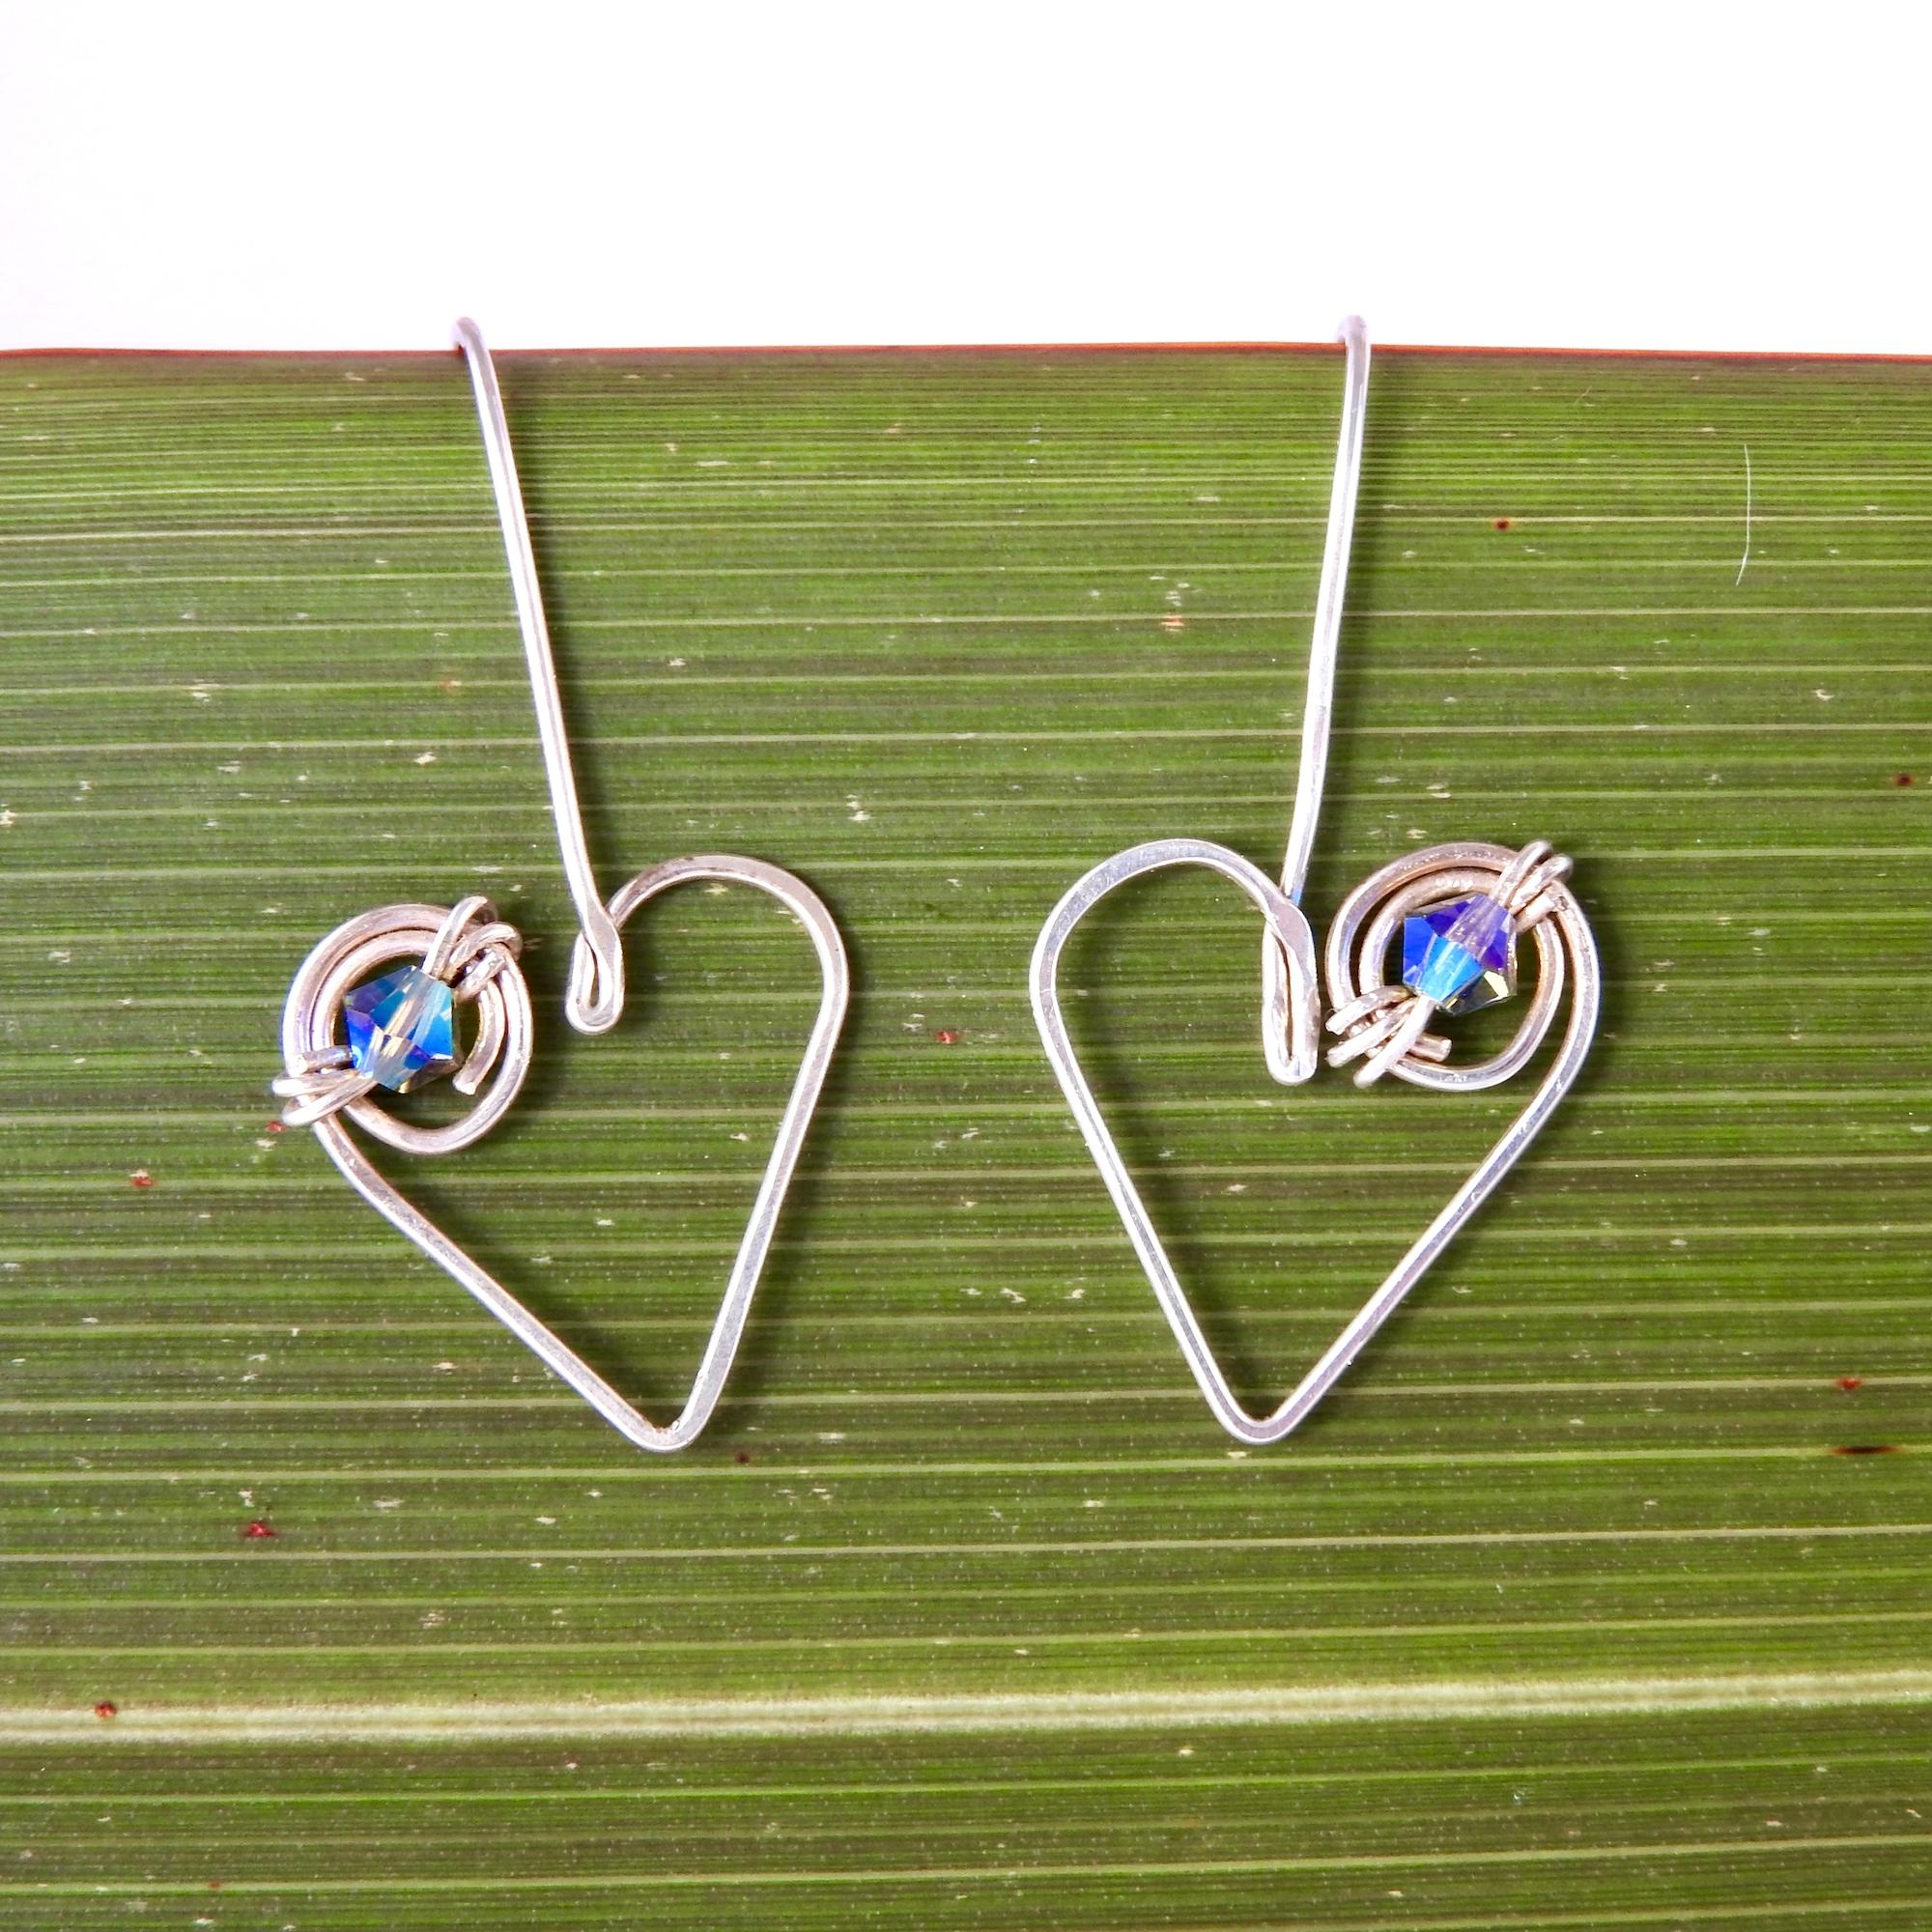 Koru Heart Dangle Earrings with Swarovski Crystals front on flax